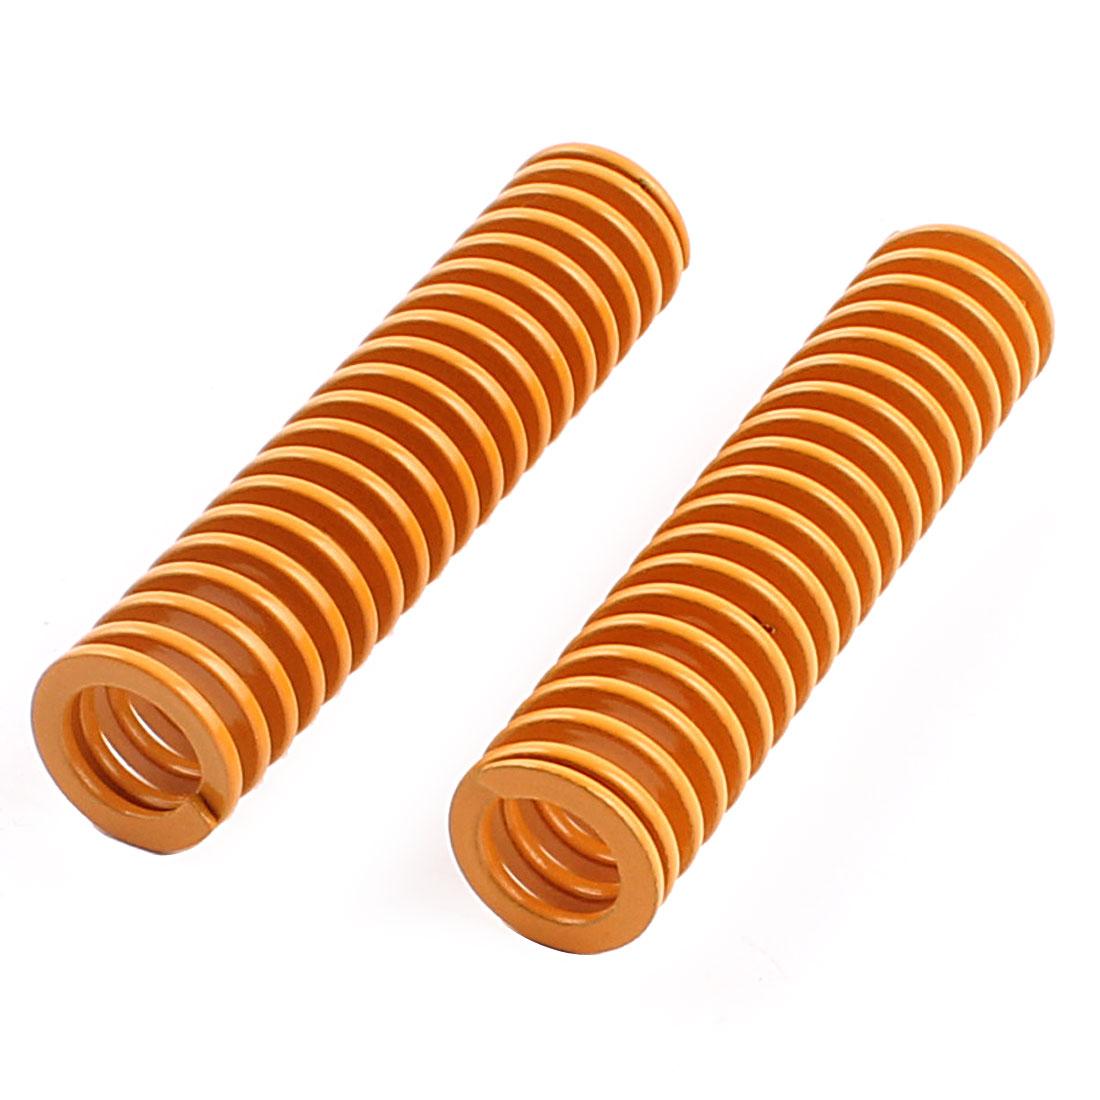 14mm x 60mm Mechanical Metal Spiral Compression Coil Die Spring 2pcs